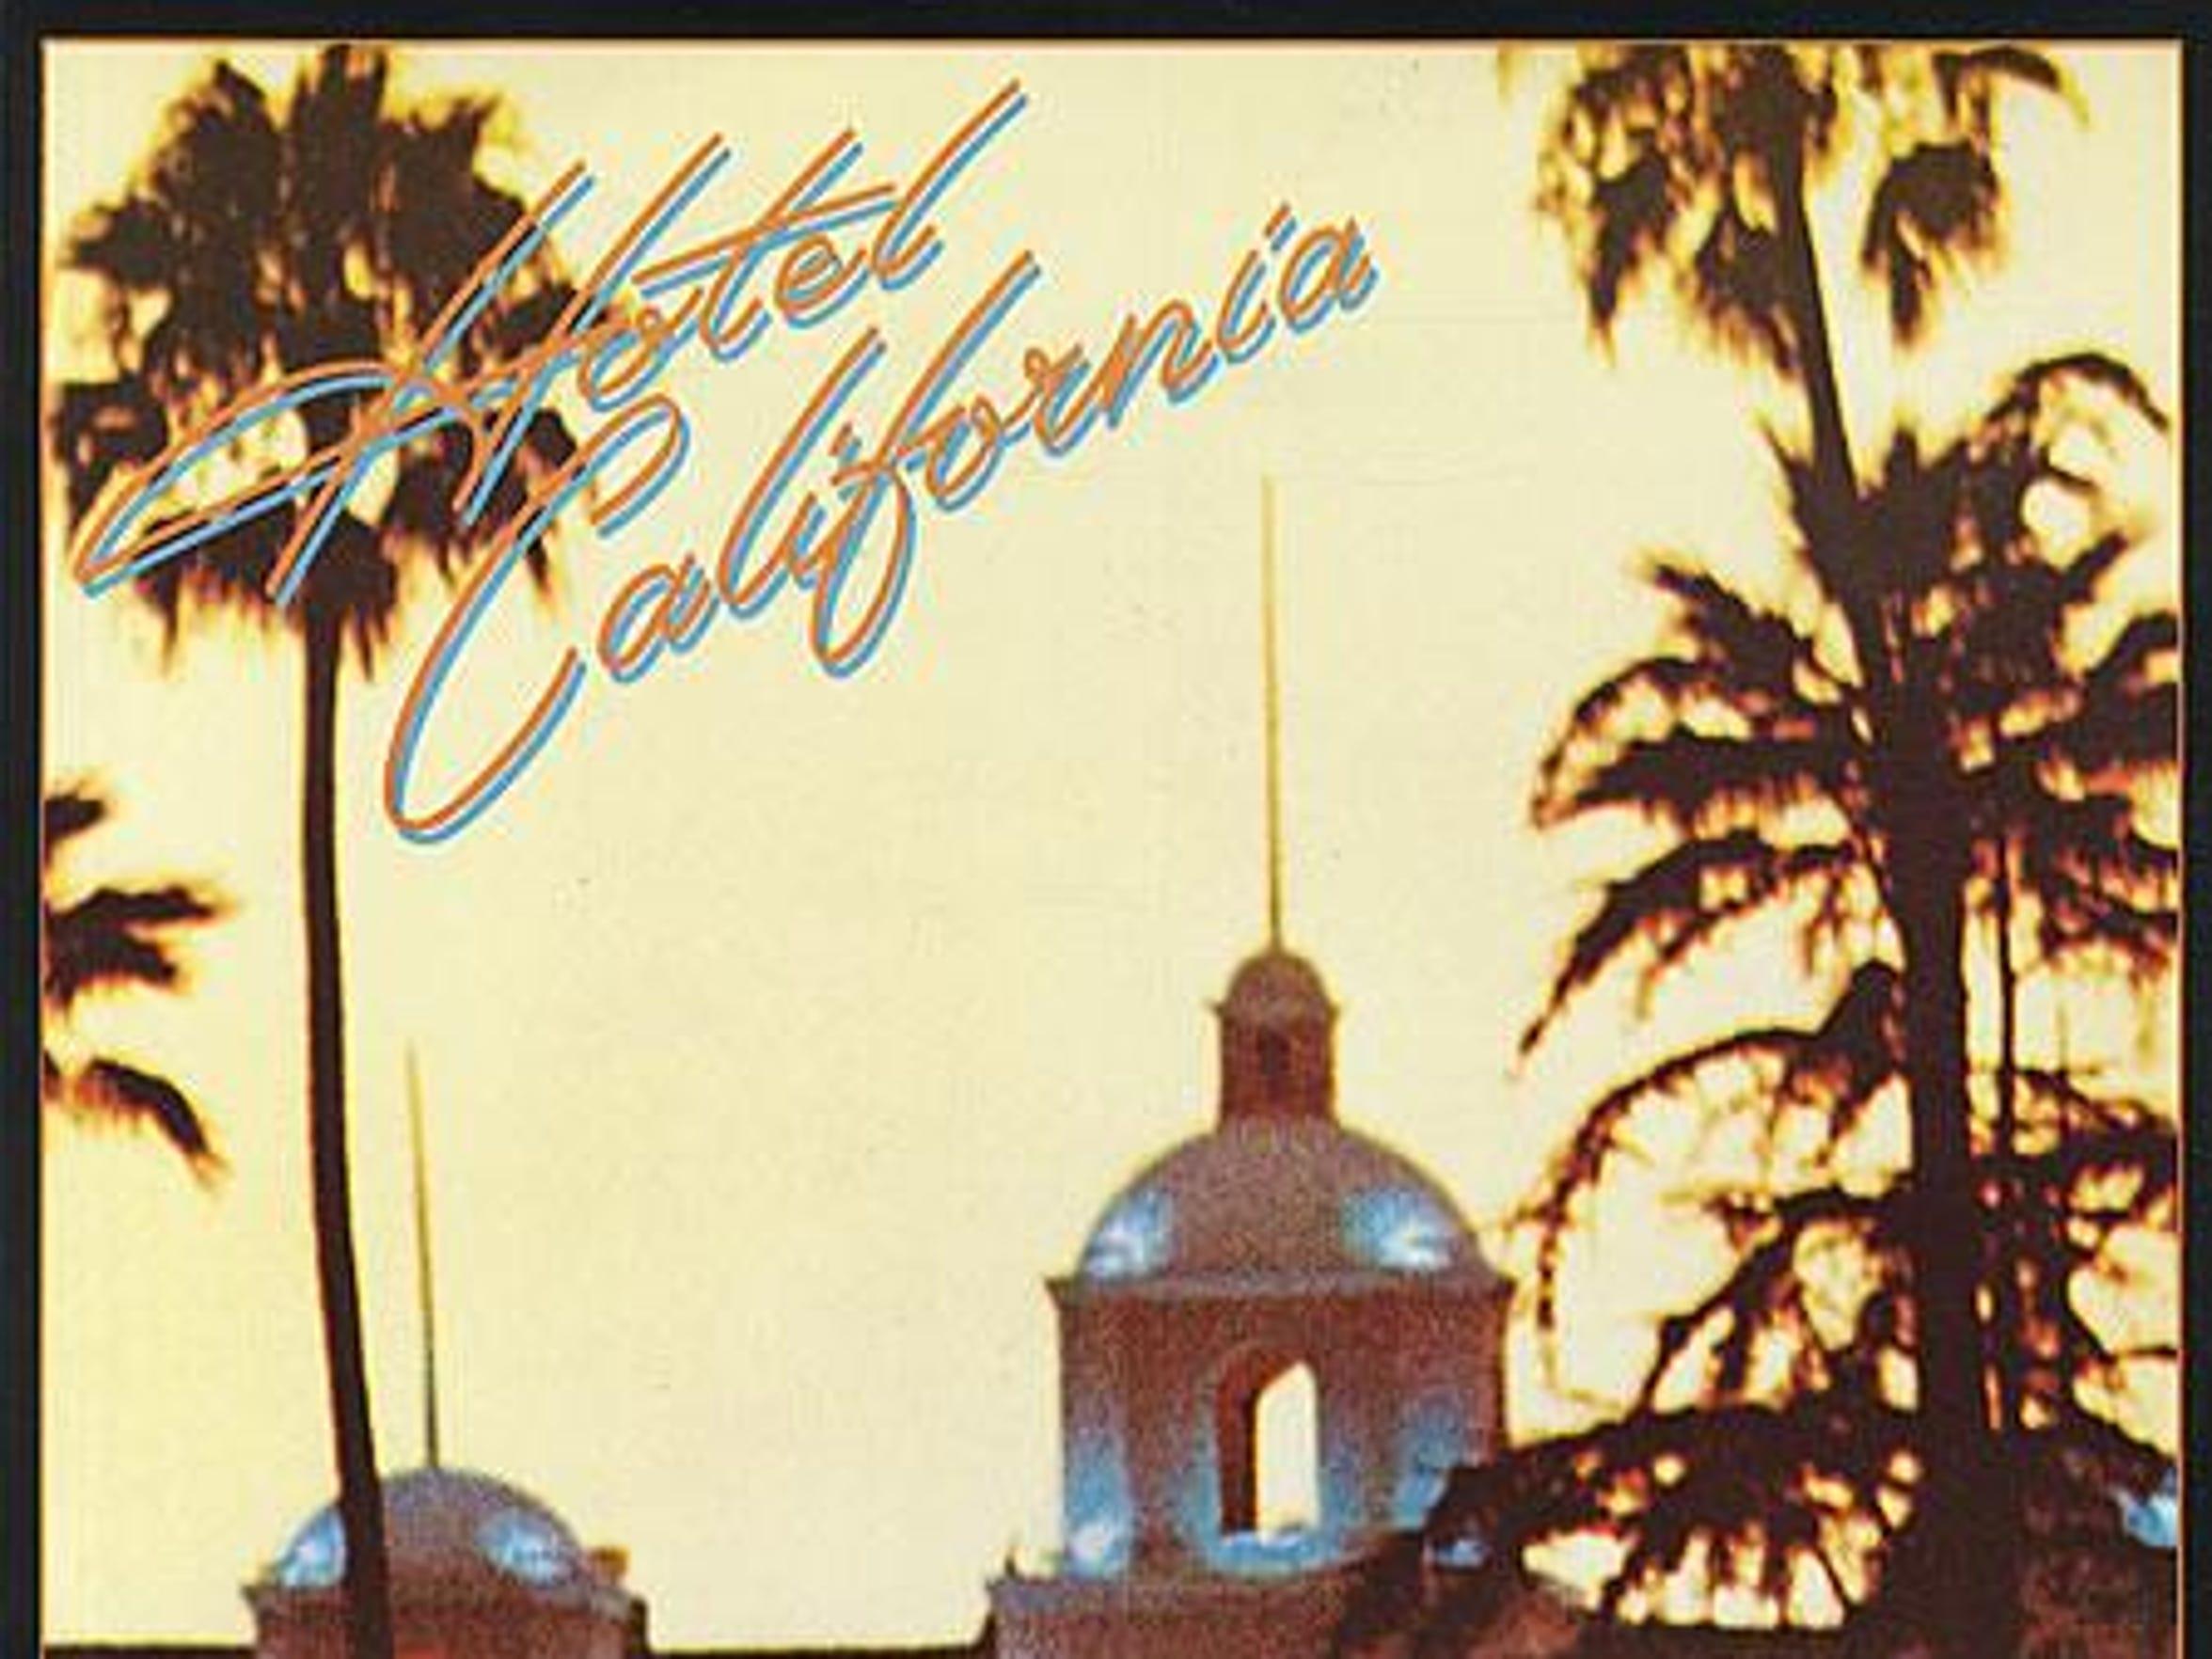 Hotel California (1976)